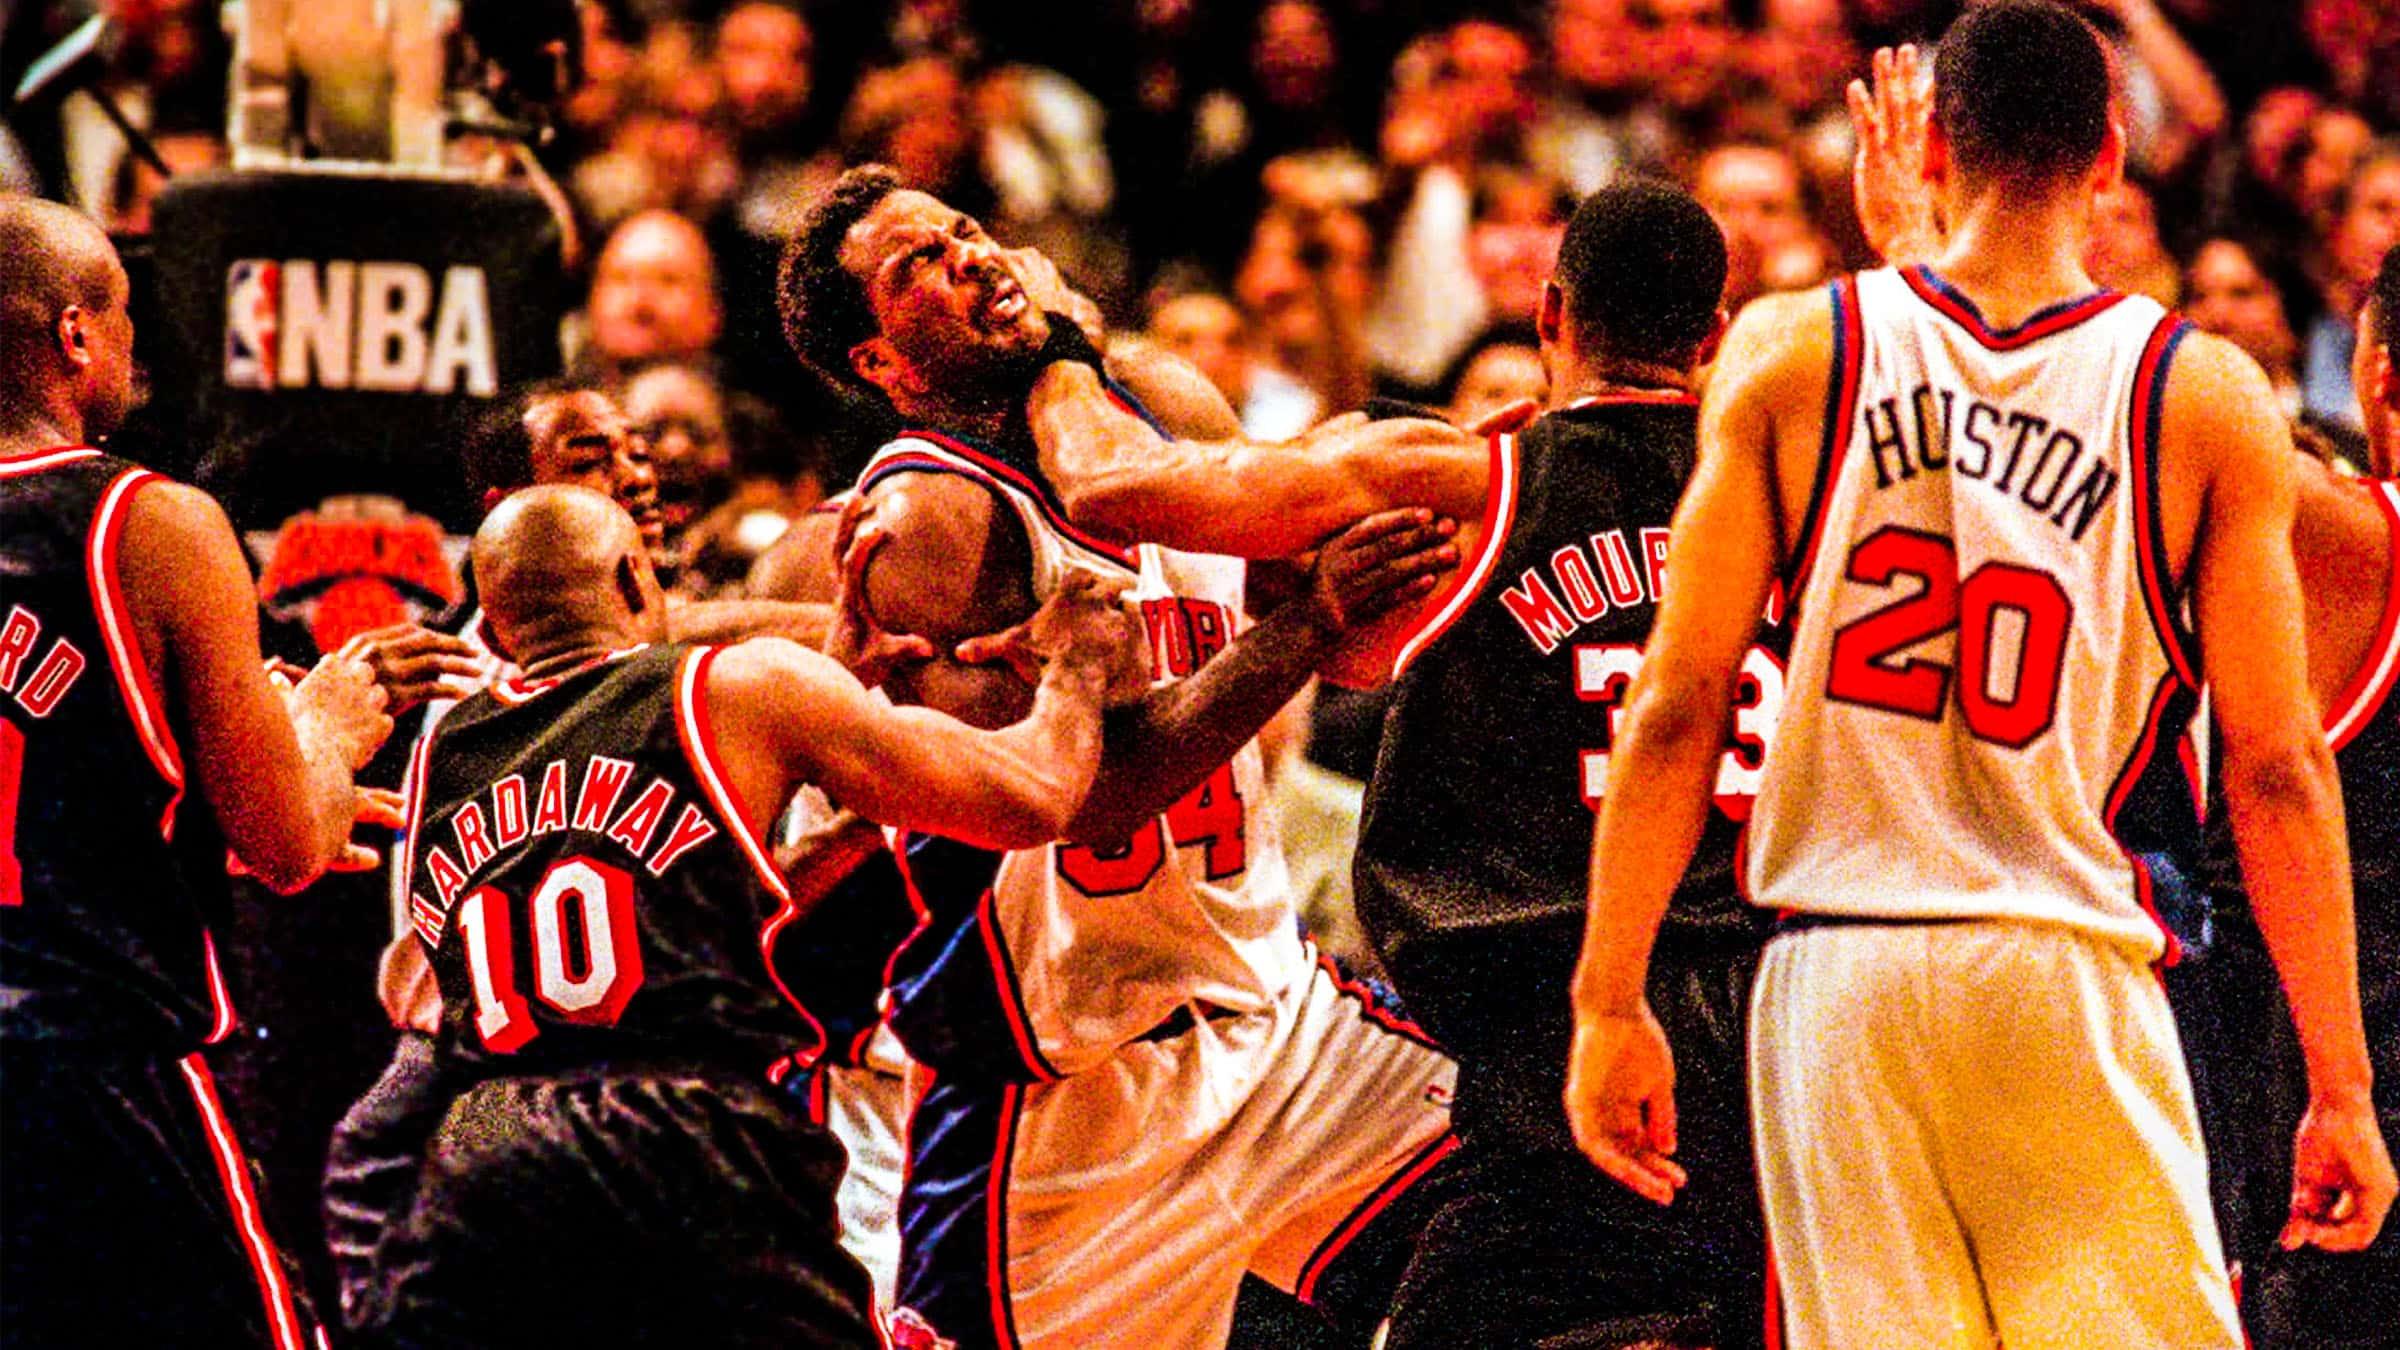 New York Knicks: New York Knicks Greatest NBA Team Fights Of The 1990s